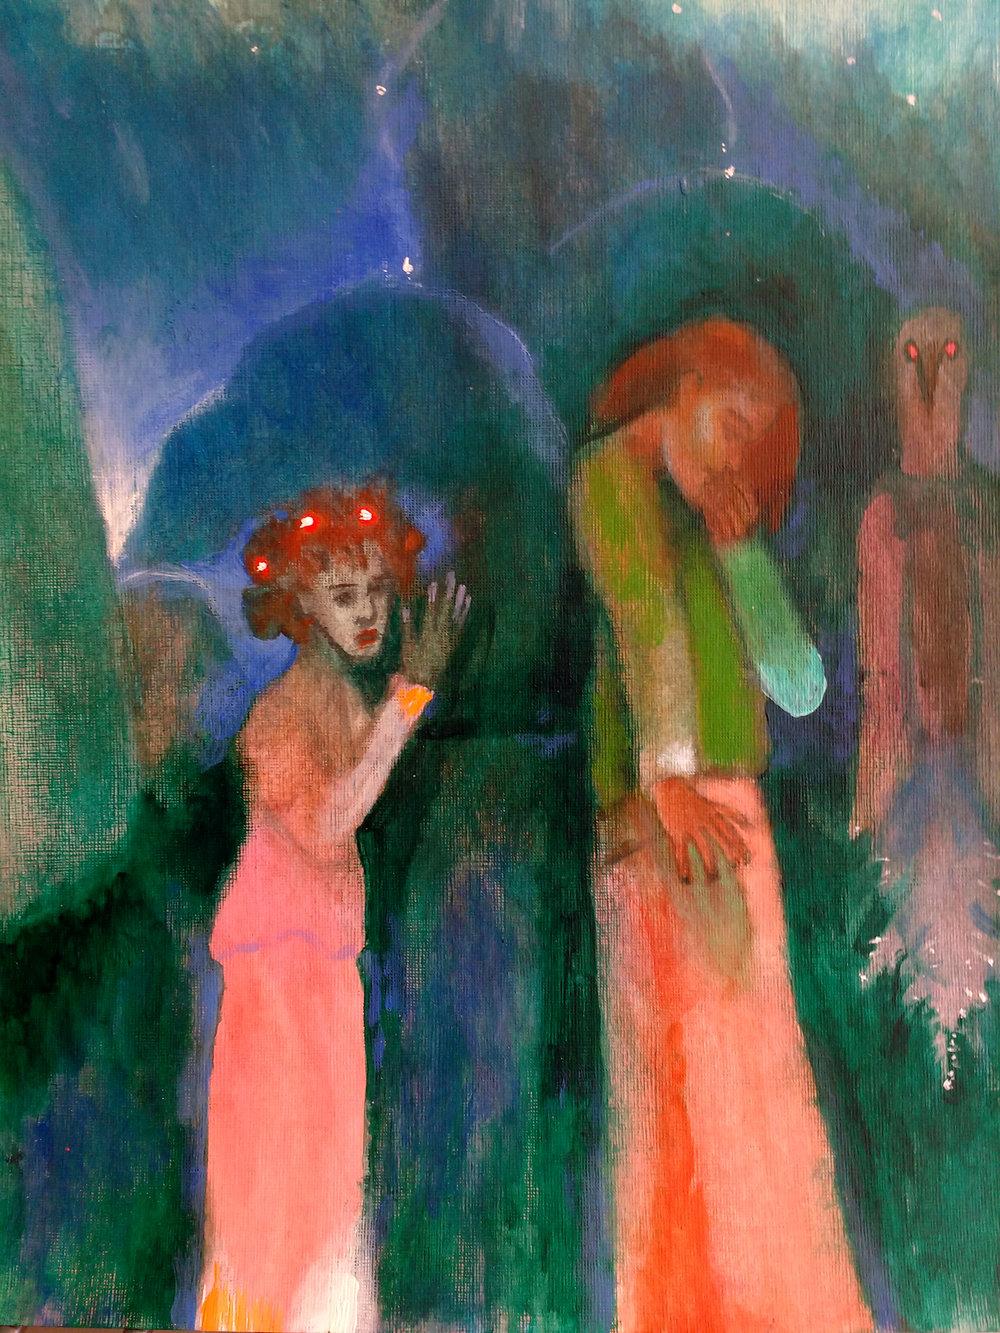 New Dawn, 2015, Acrylic on Paper, 40.5 x 30.5 cm